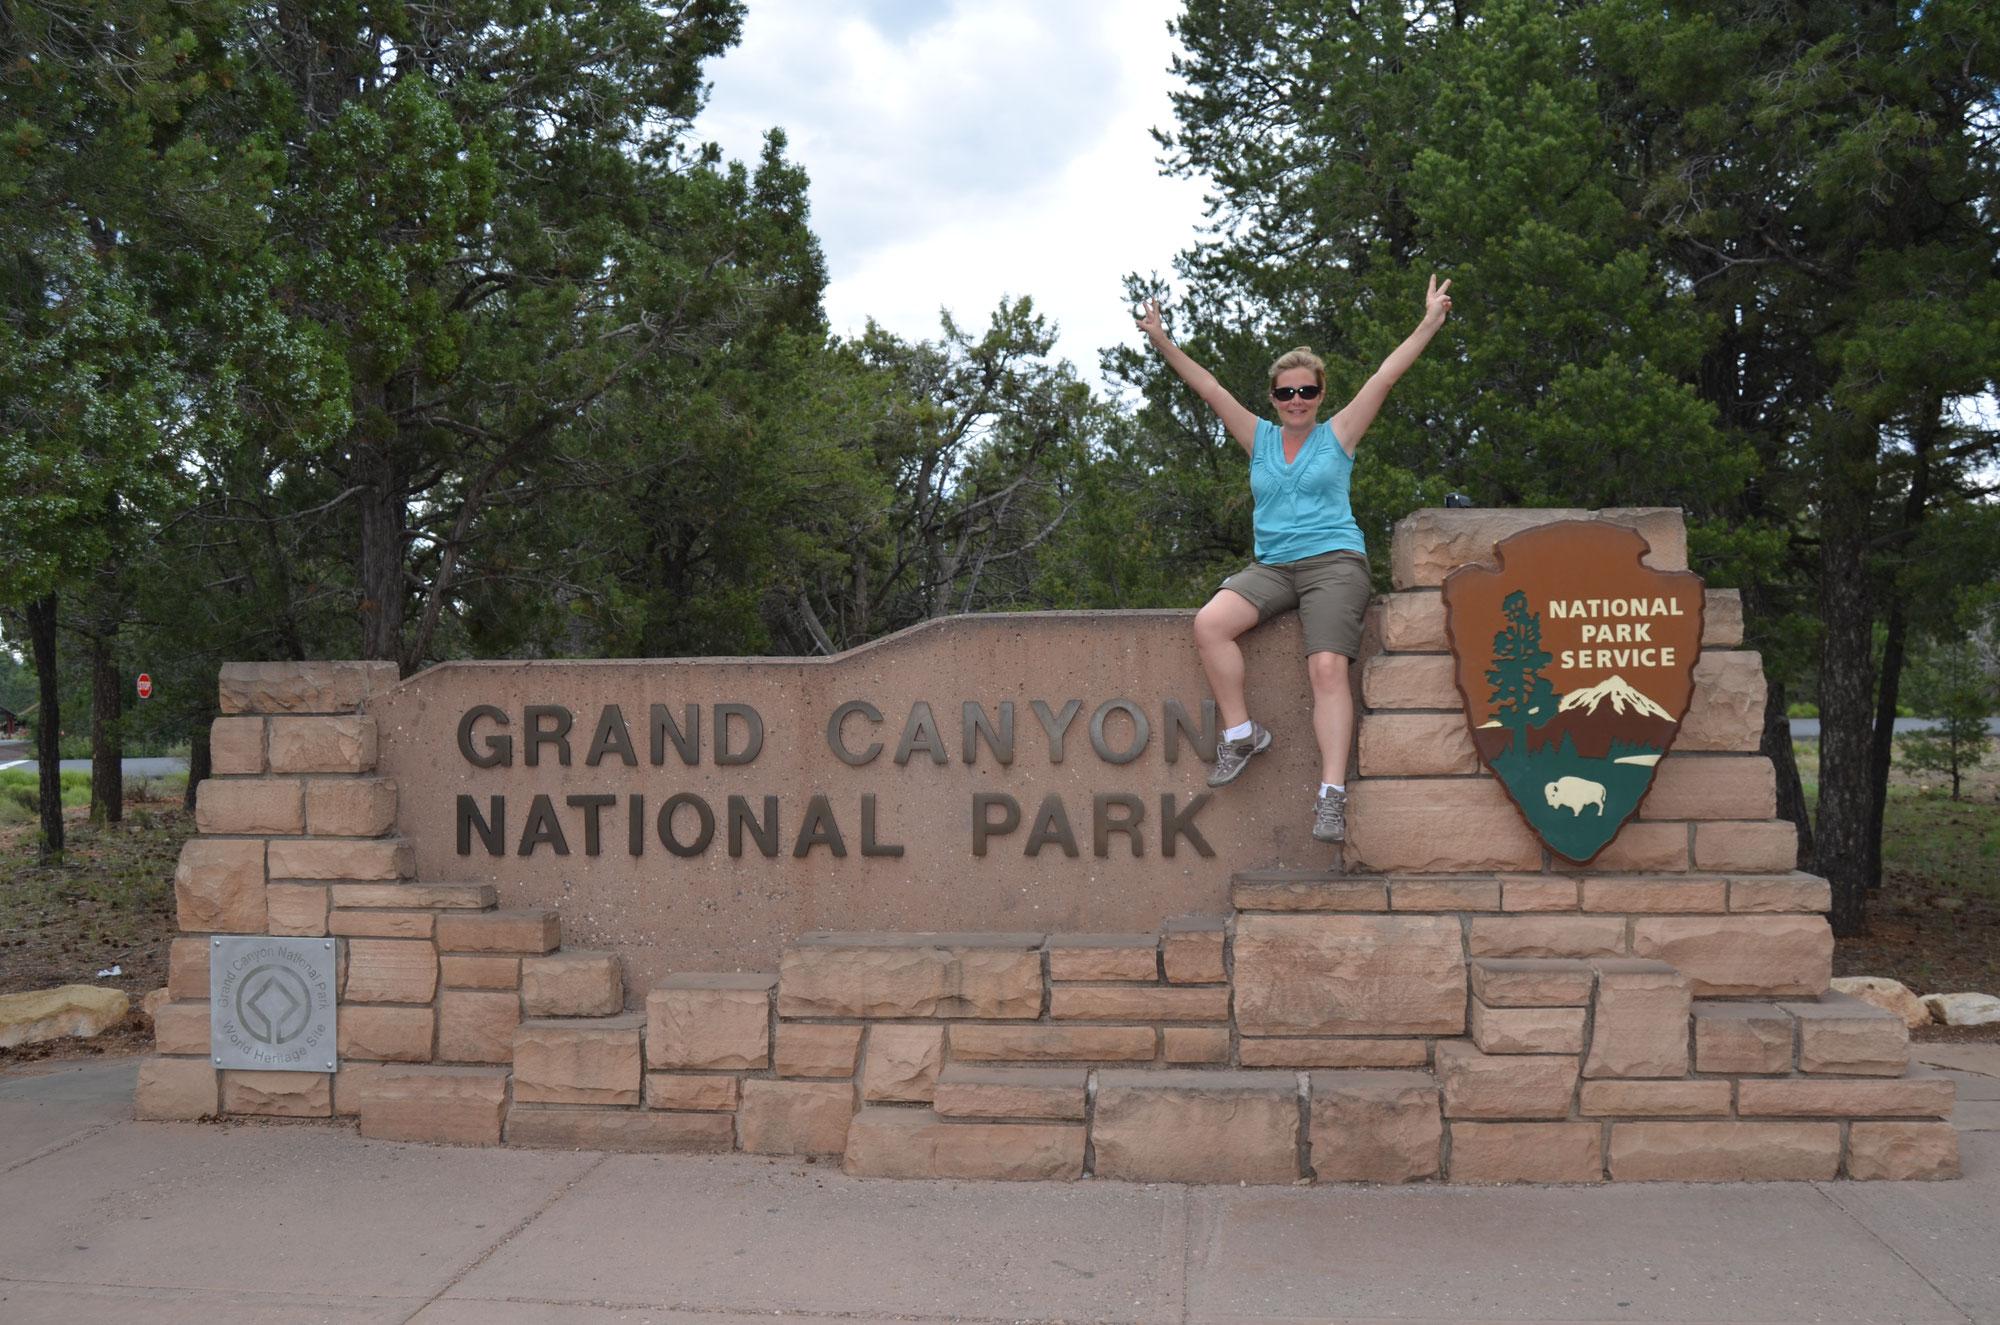 ROAD TRIP USA #1 - Grand Canyon National Park